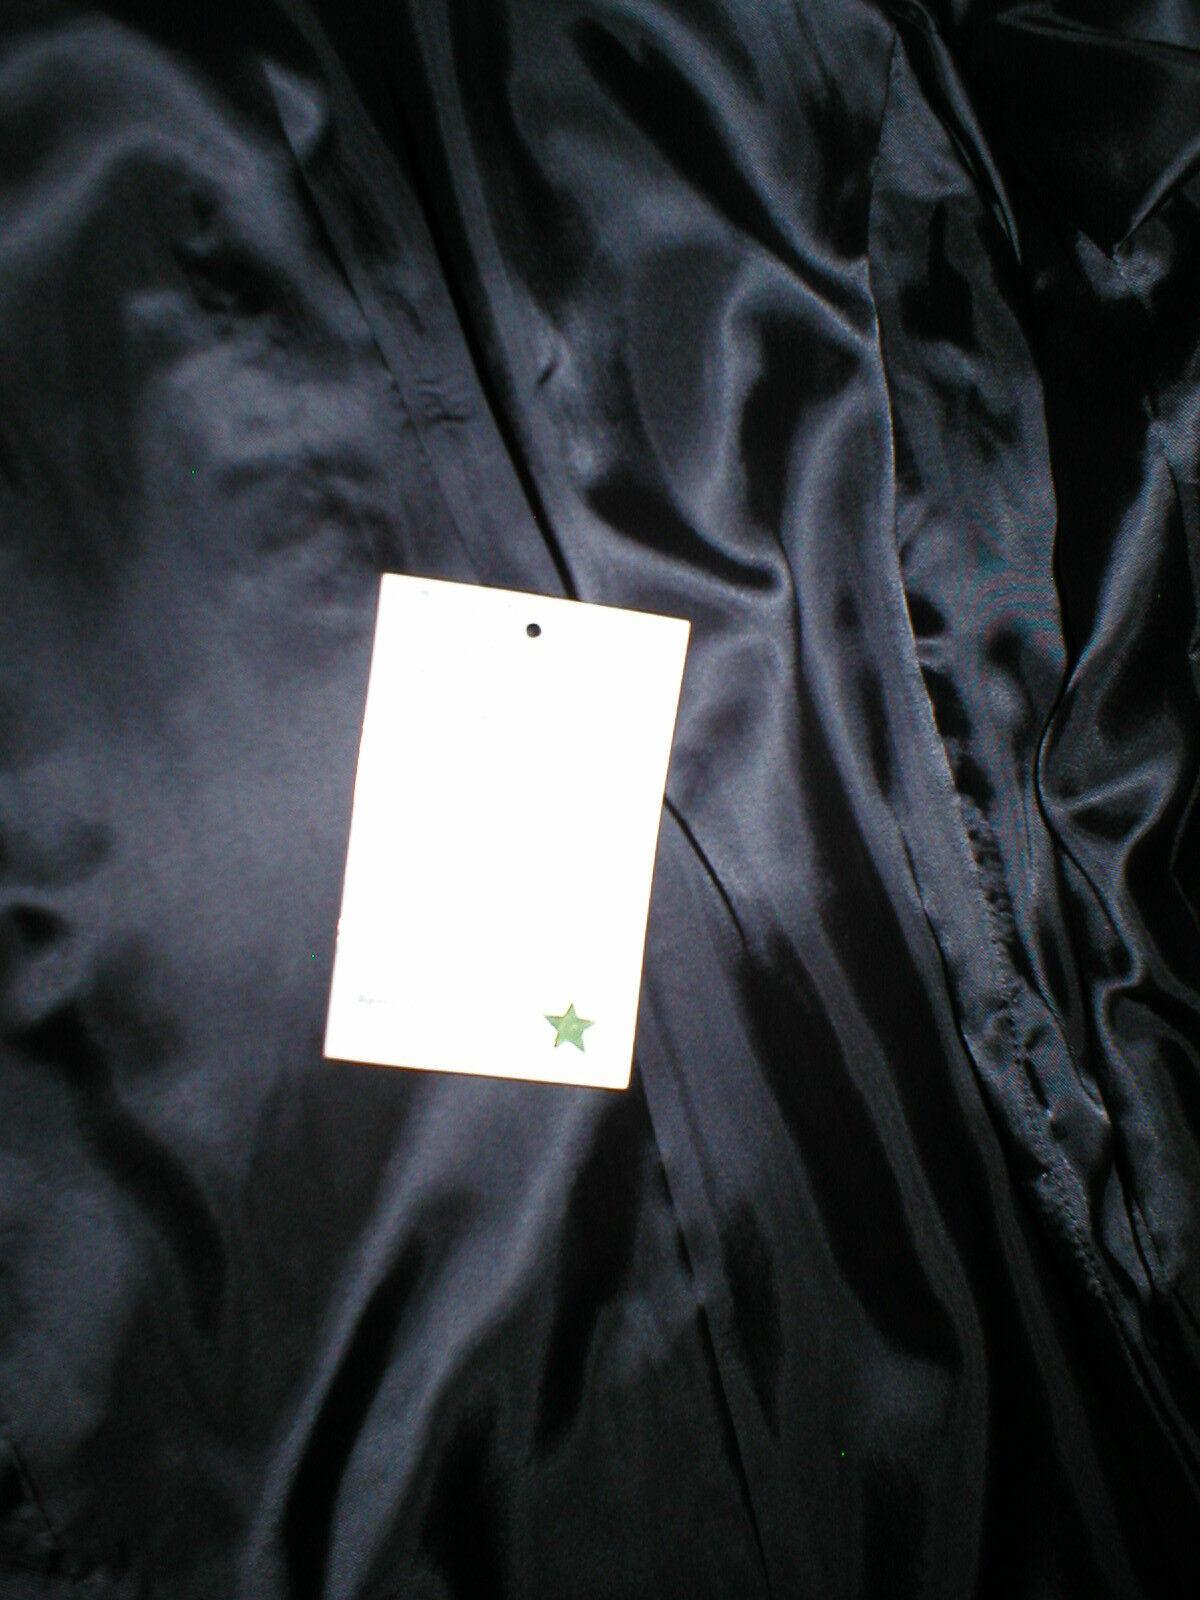 New Womens S Soft Karl Lagerfeld Paris Leather Jacket Black Silver Designer Lamb image 11